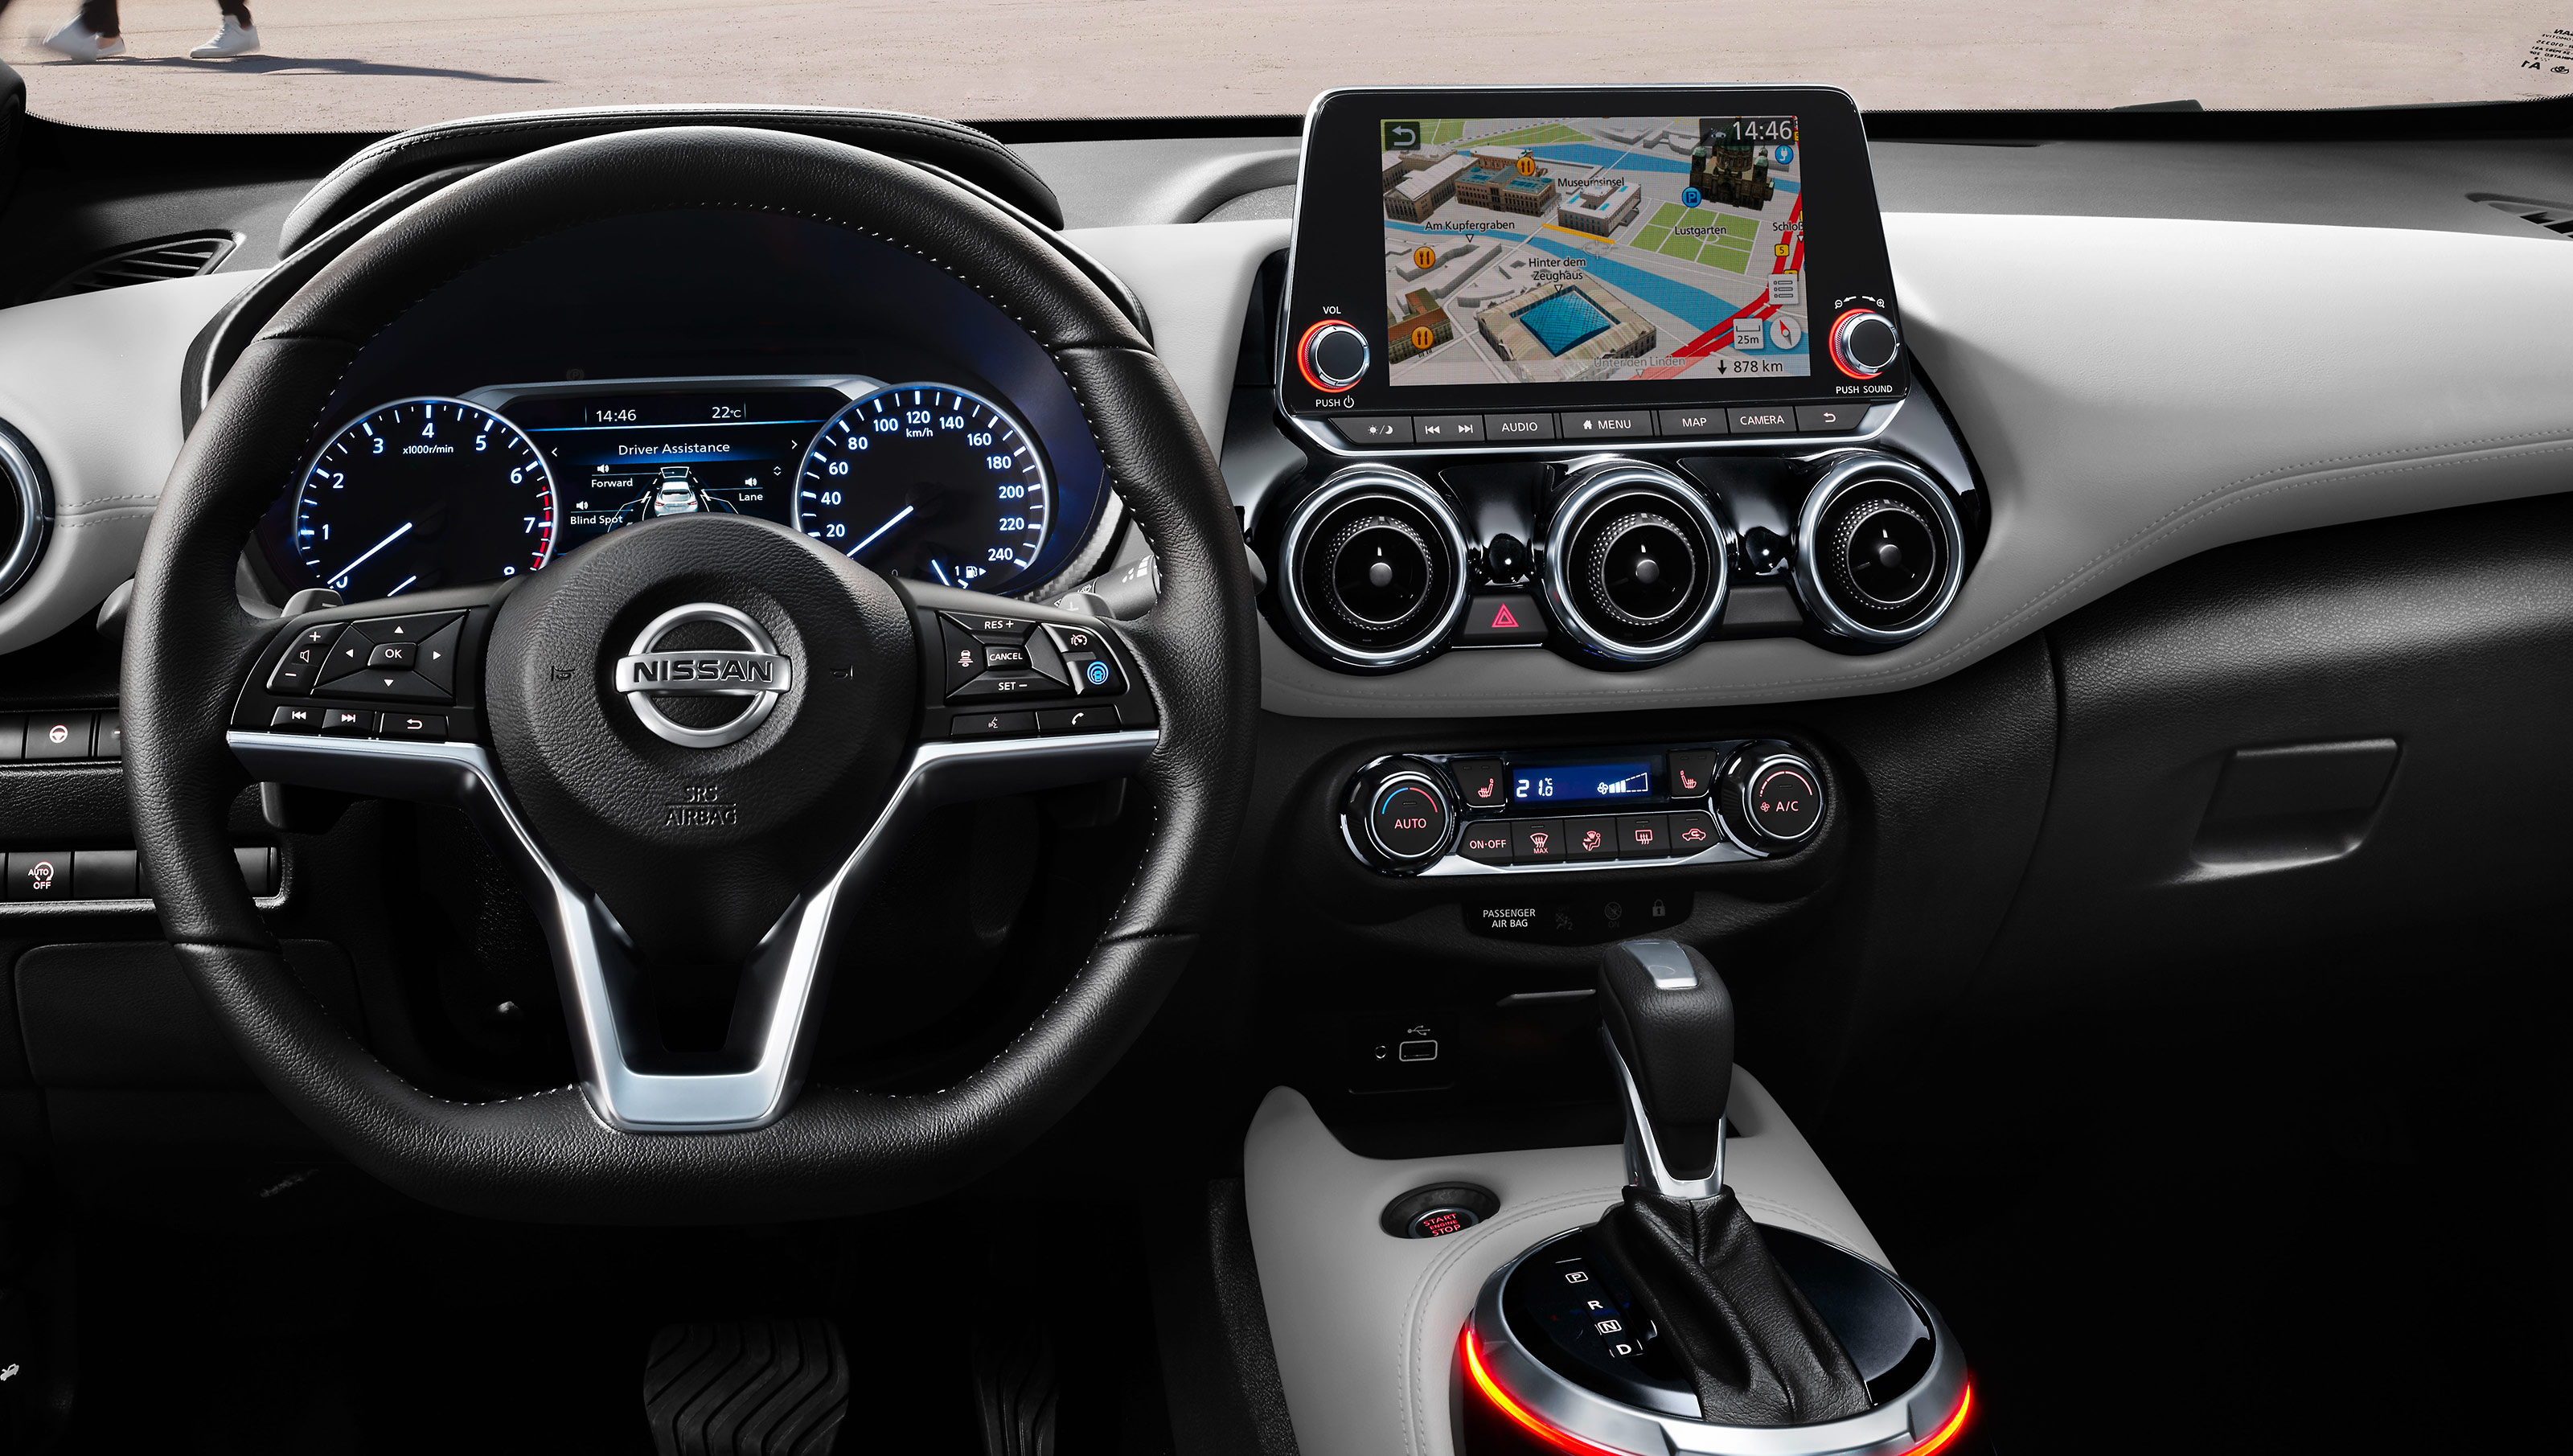 Nissan JUKE immersive driver cockpit